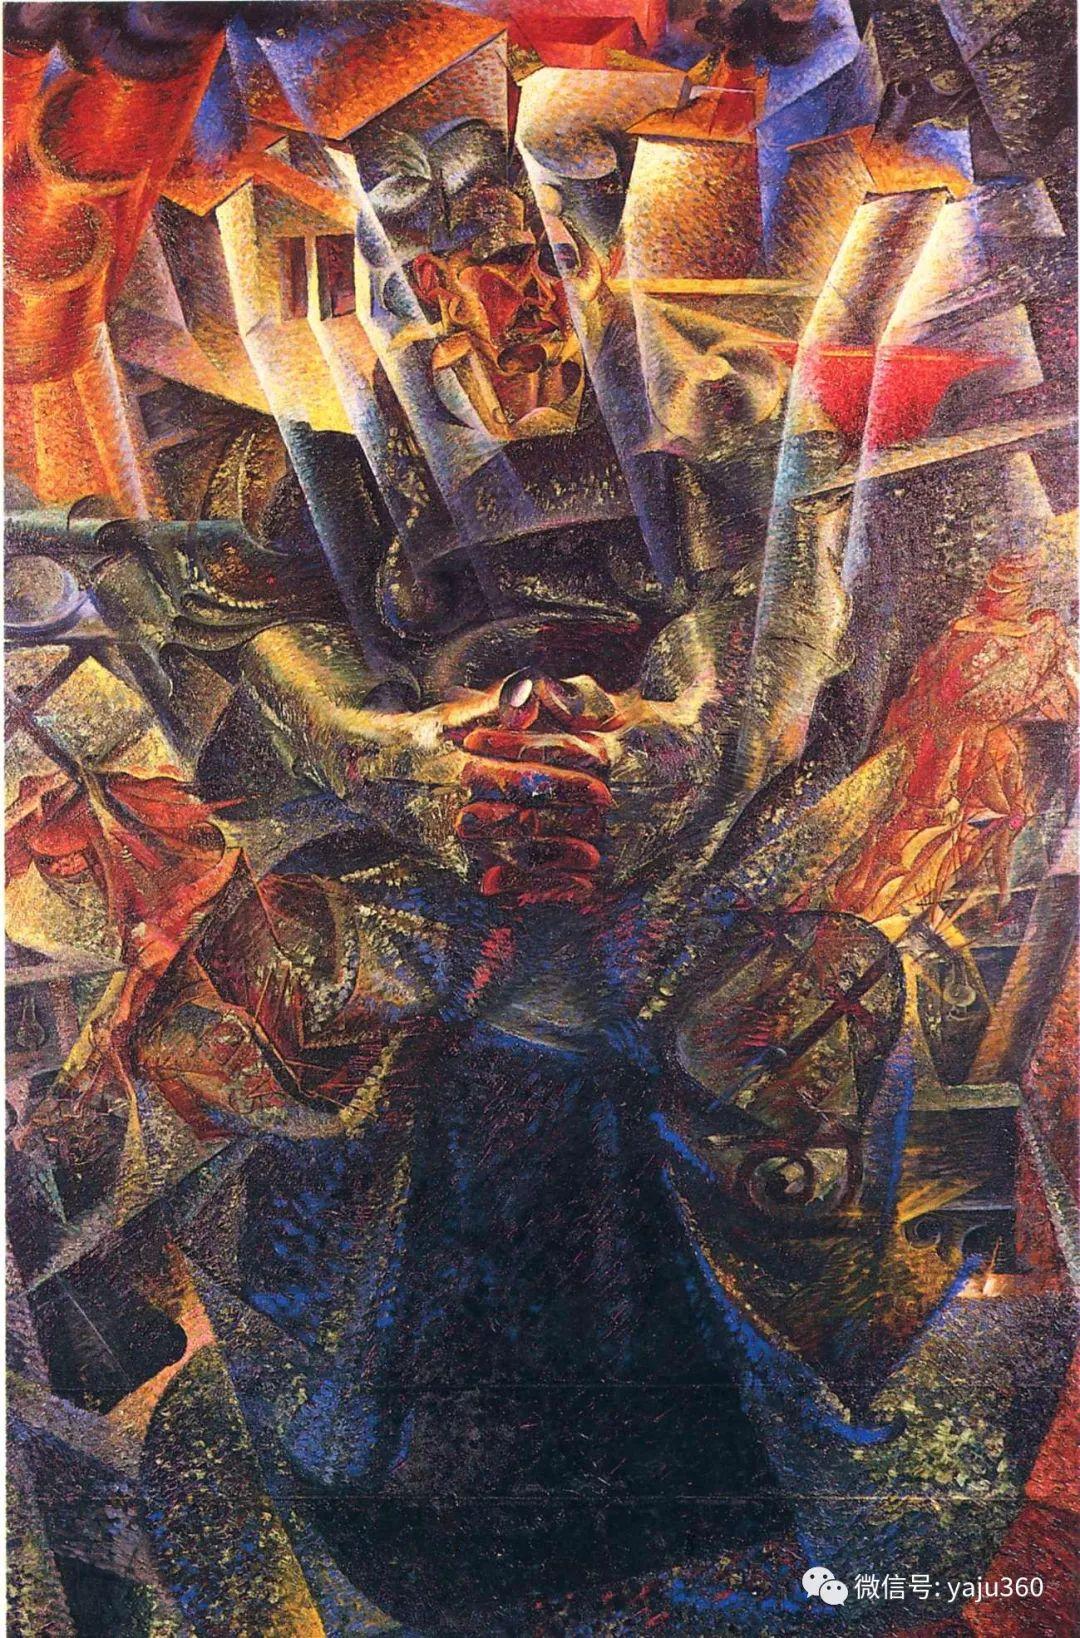 未来主义 意大利画家Umberto Boccioni插图55